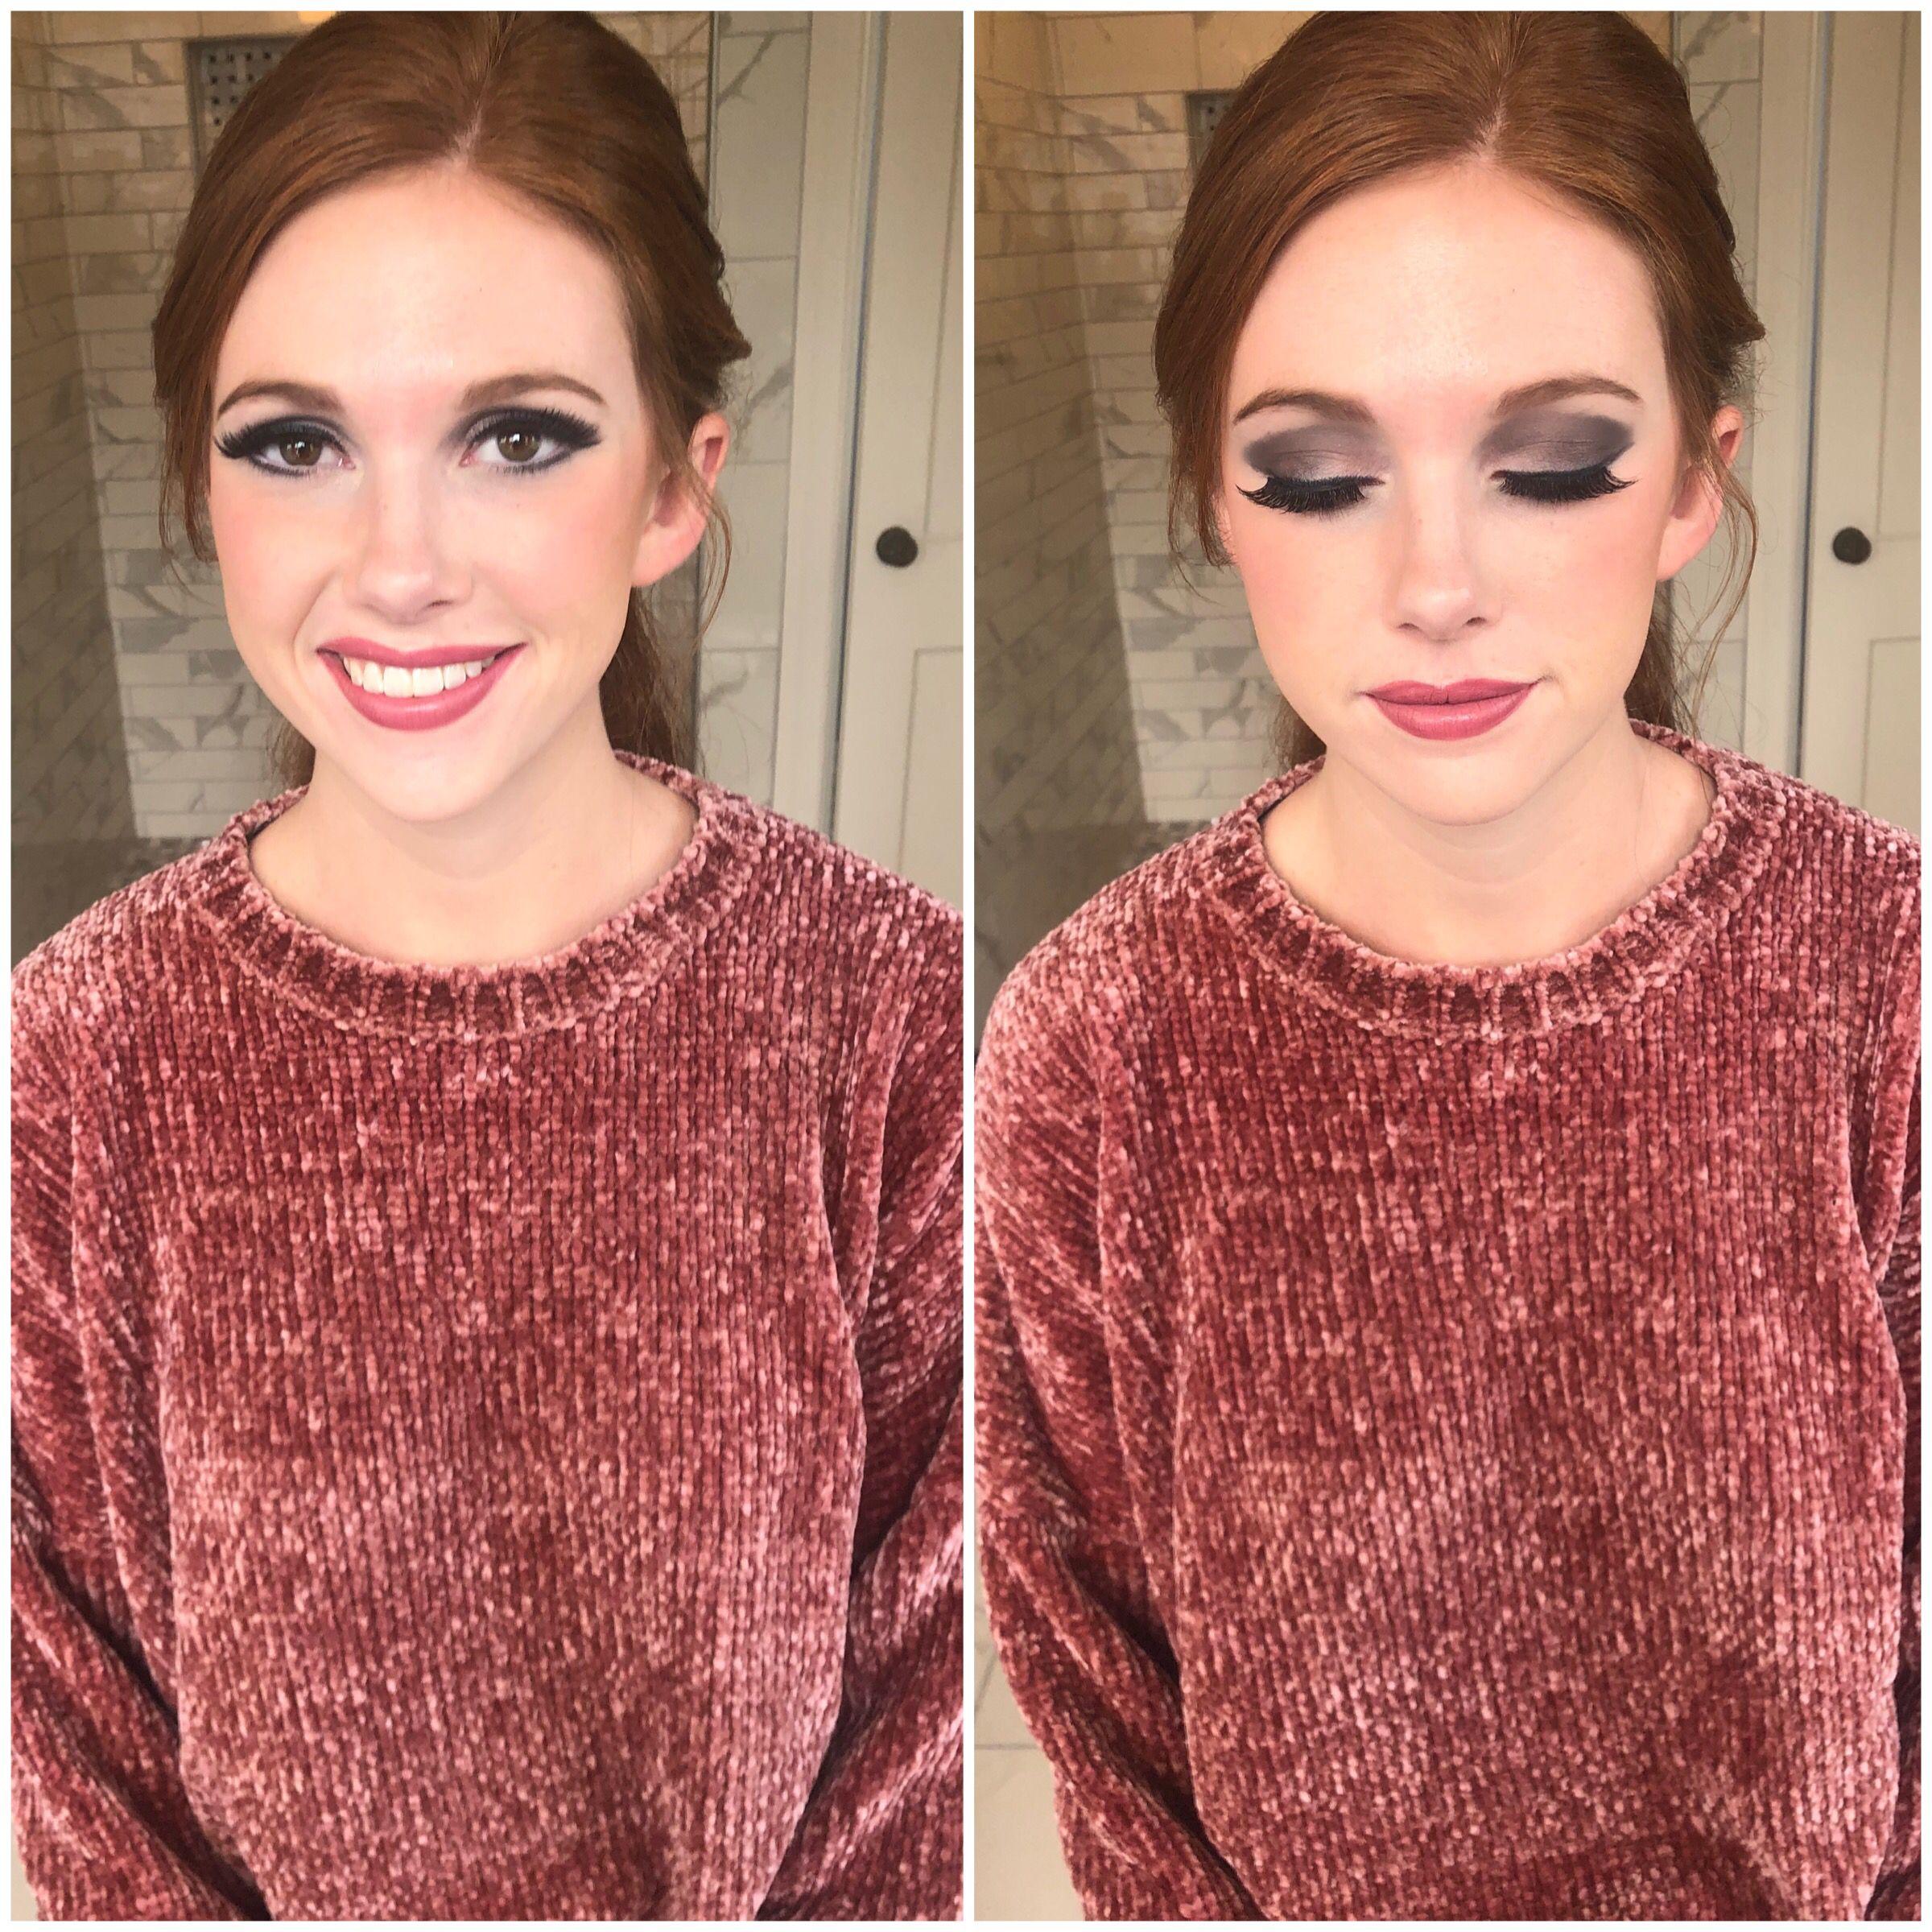 Airbrush makeup Silverceiling Beauty Raleigh NC airbrush